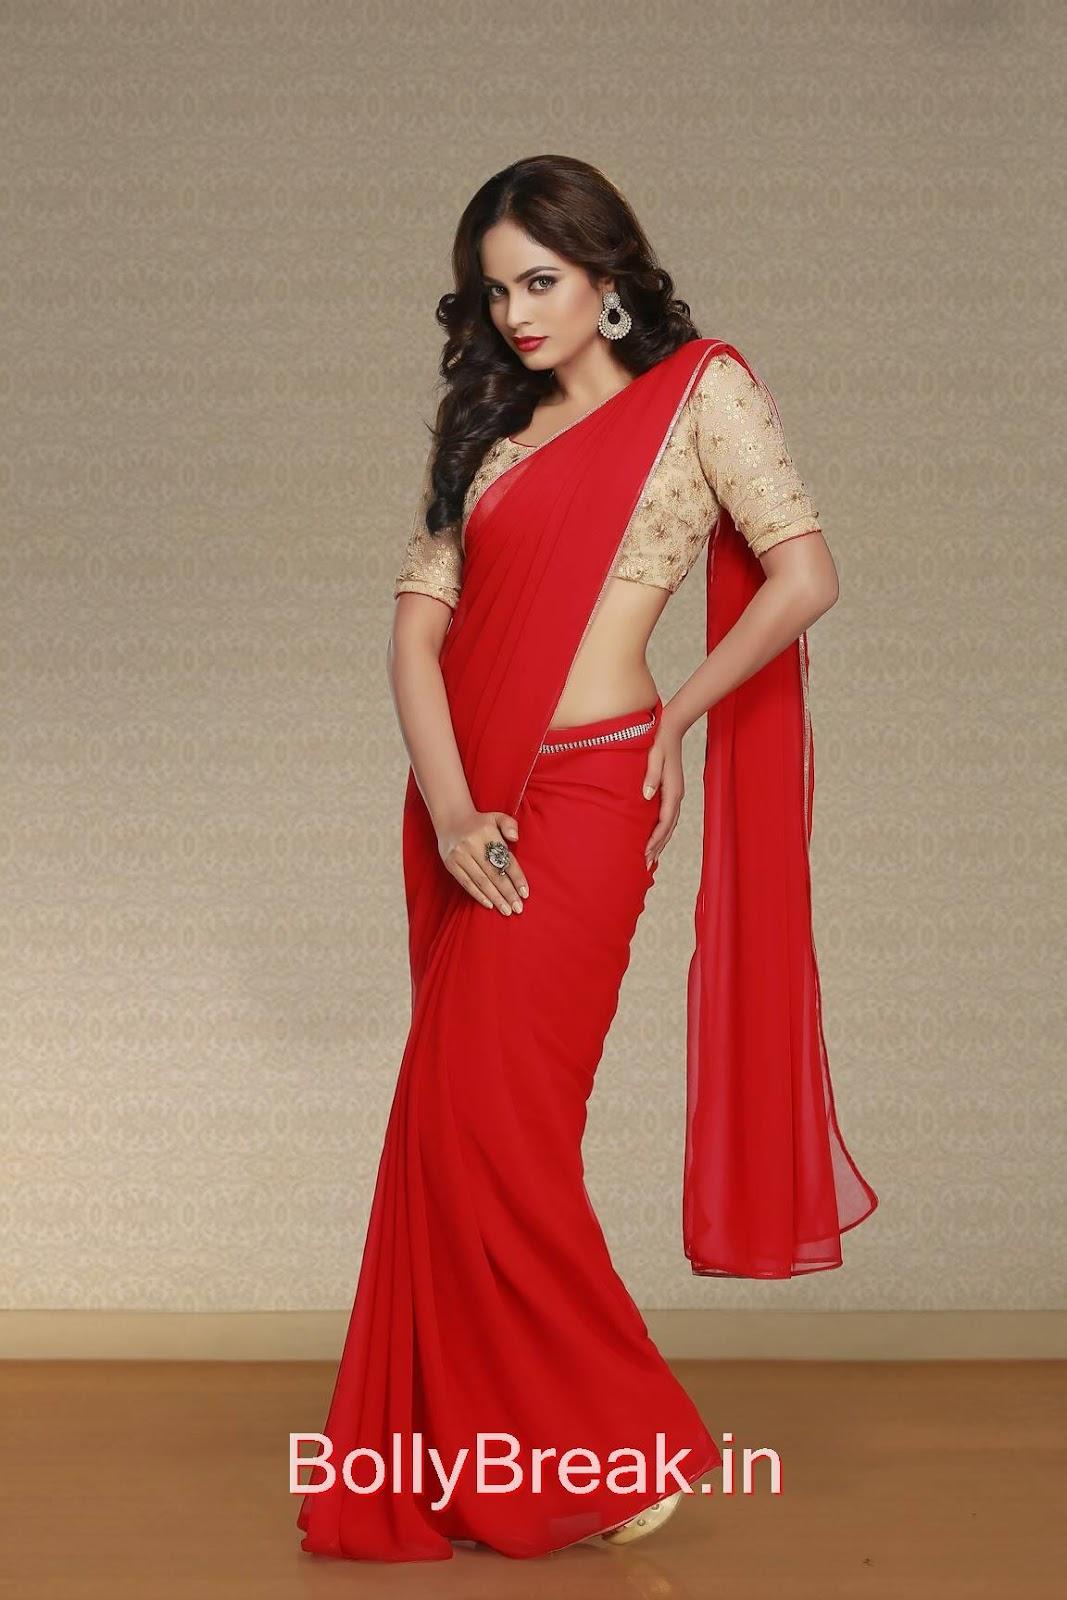 Nandita Photos, Actress Nandita Swetha in Saree - Hot HD 2015 Pics